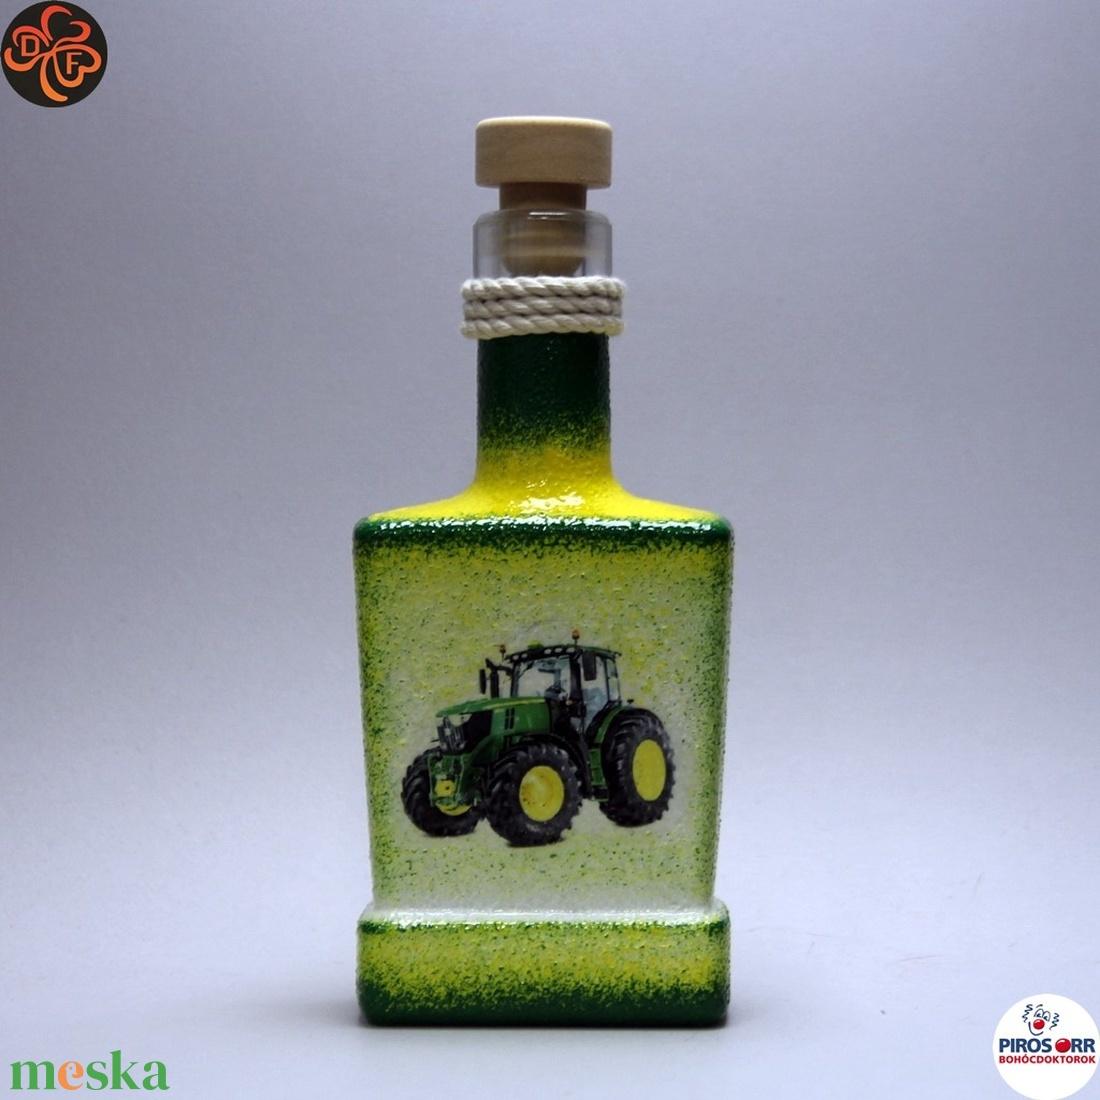 Gazda uram pálinkás flaskája ; Saját John Deere Traktorod fényképével is!  - Meska.hu